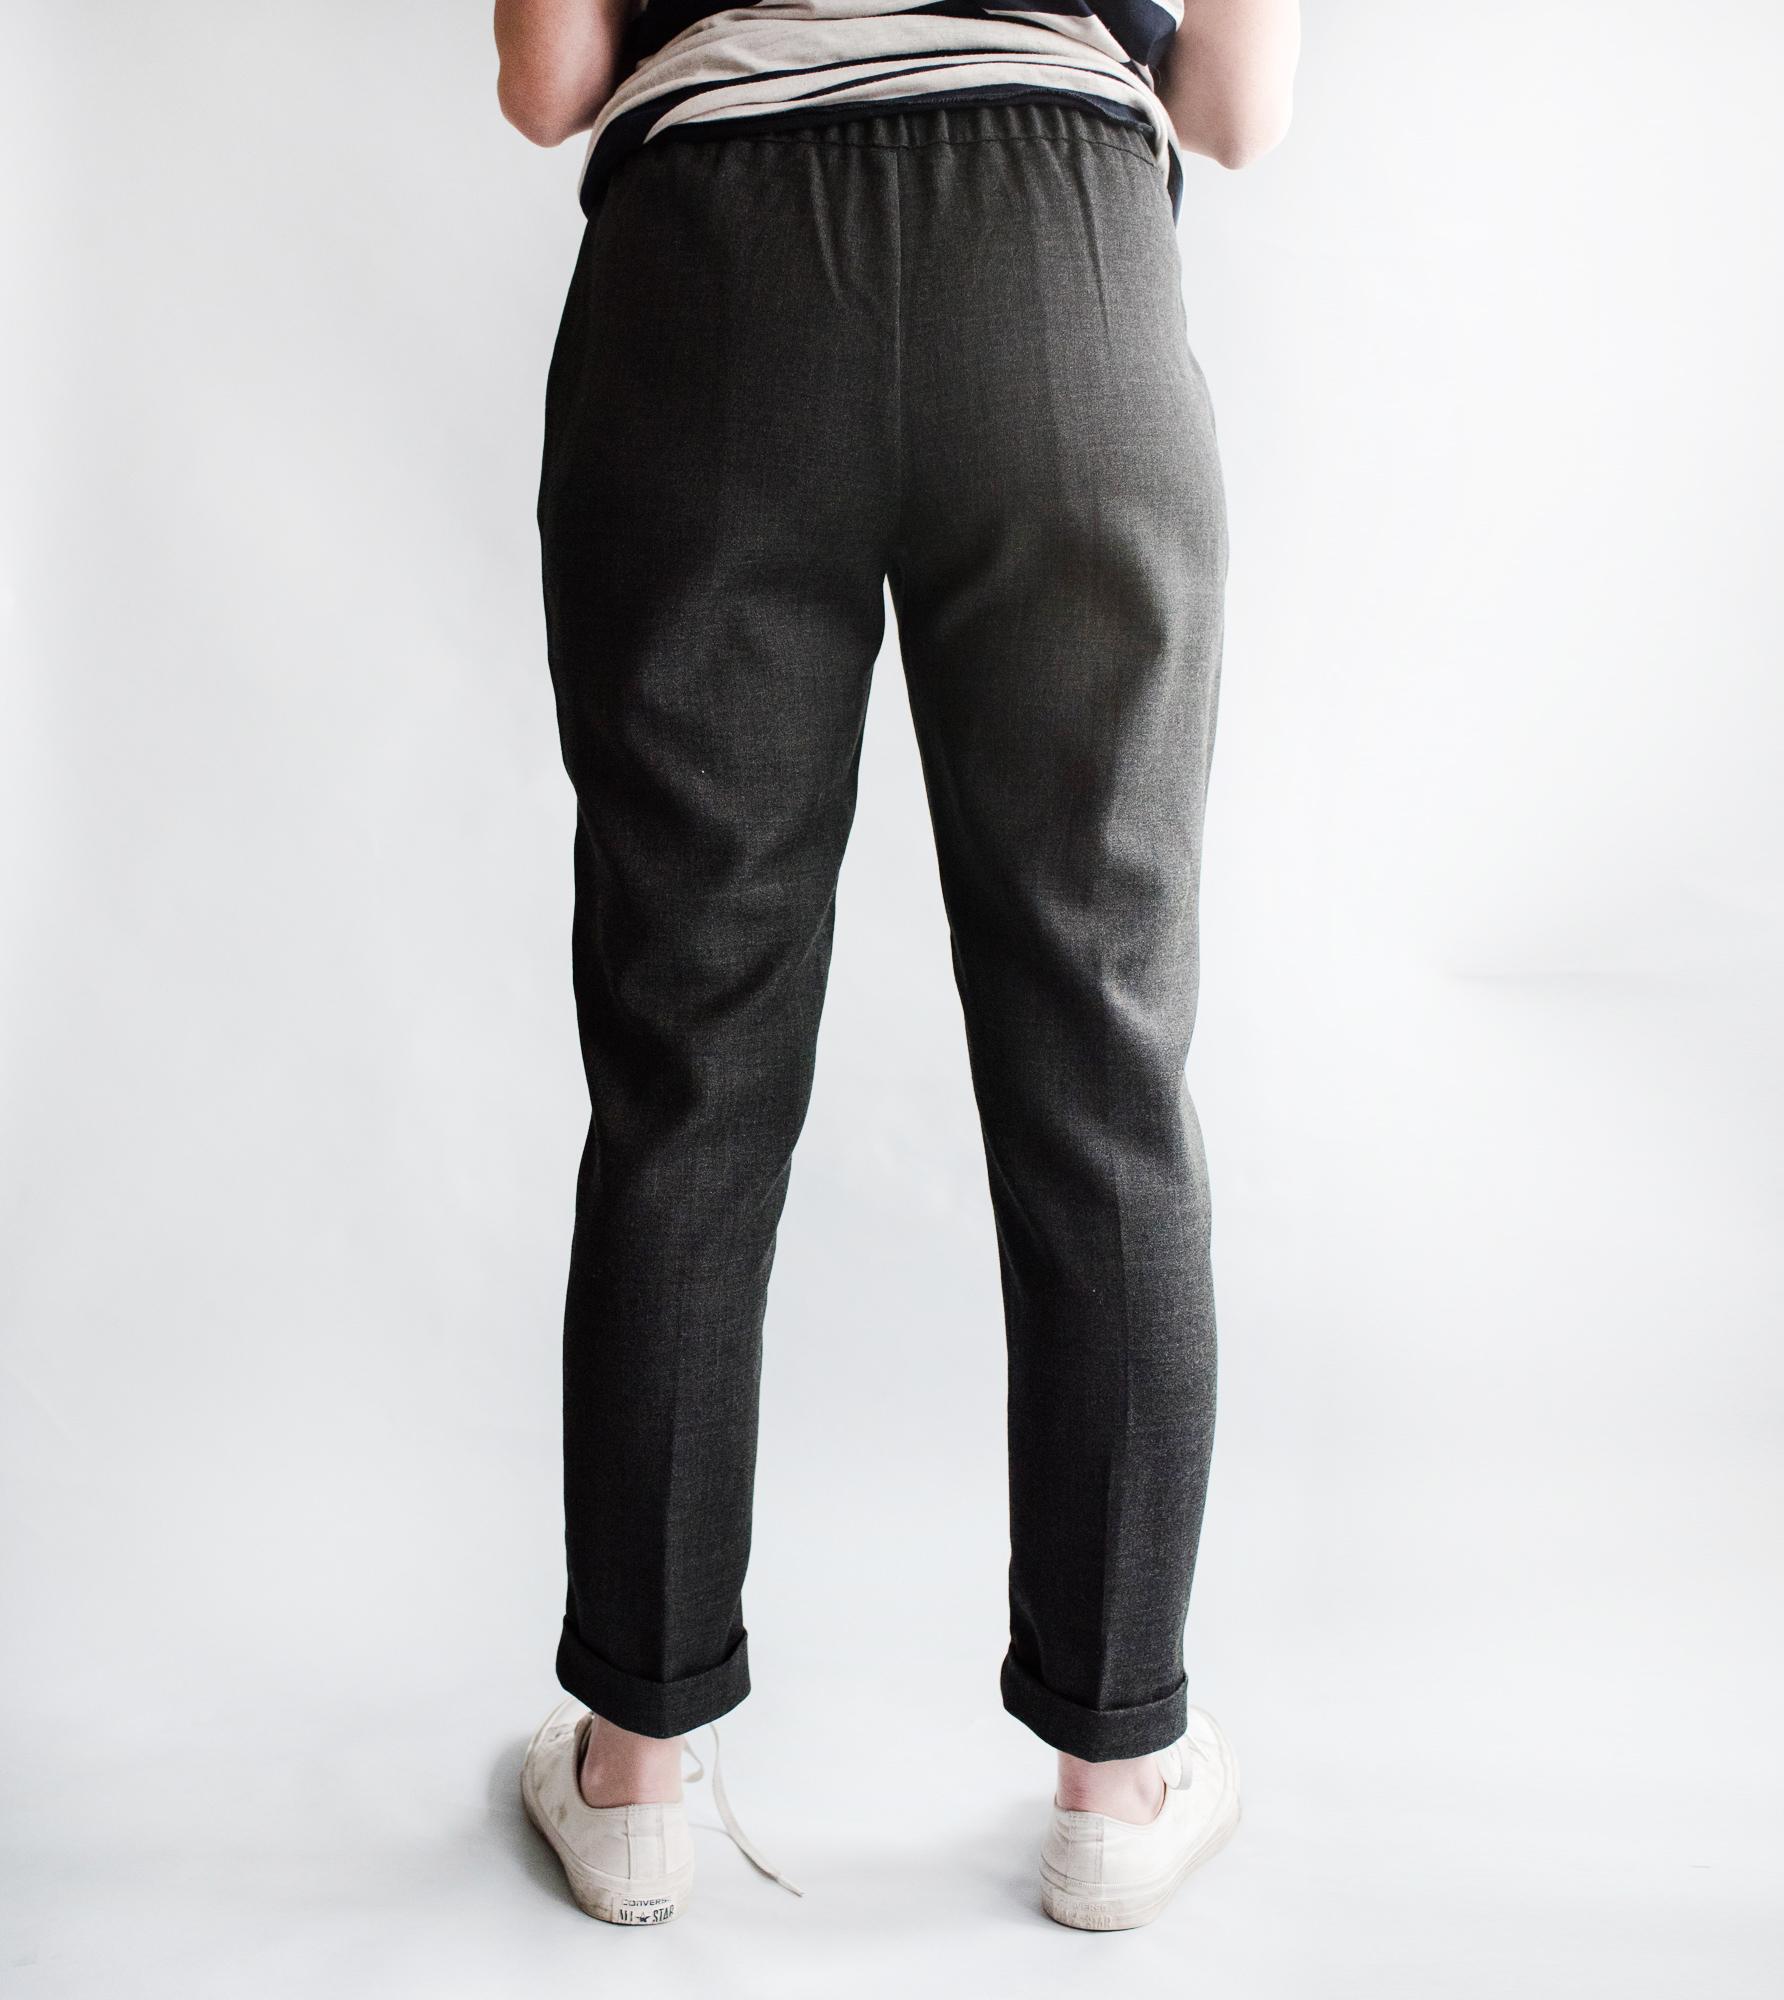 robinson-pdf-sewing-trouser02.jpg